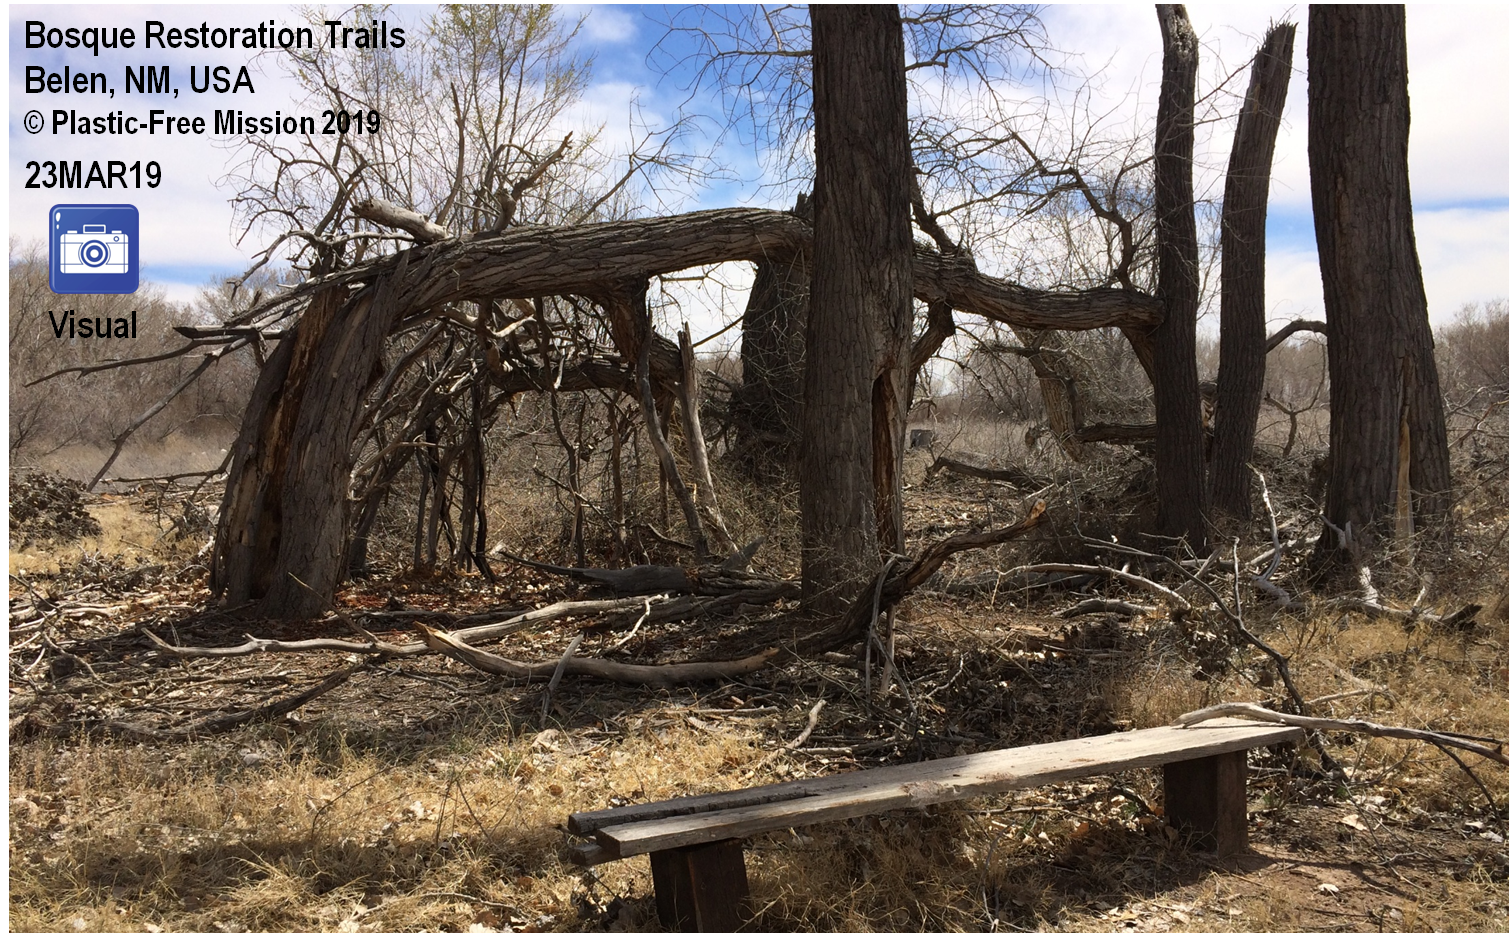 Bosque Restoration Trails, Belen, NM, USA